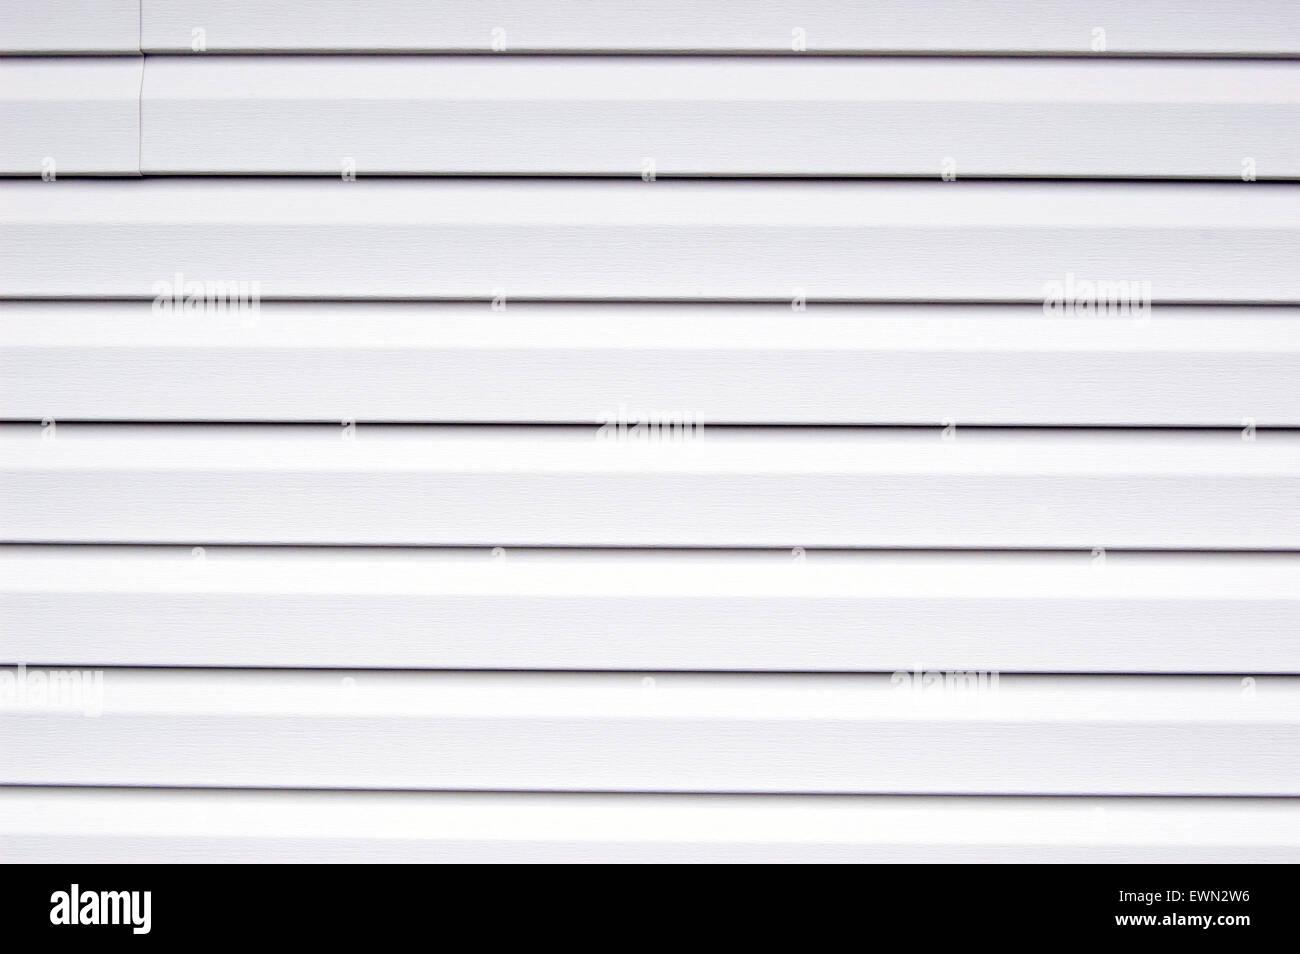 Aluminum siding horizontal shot close up. - Stock Image